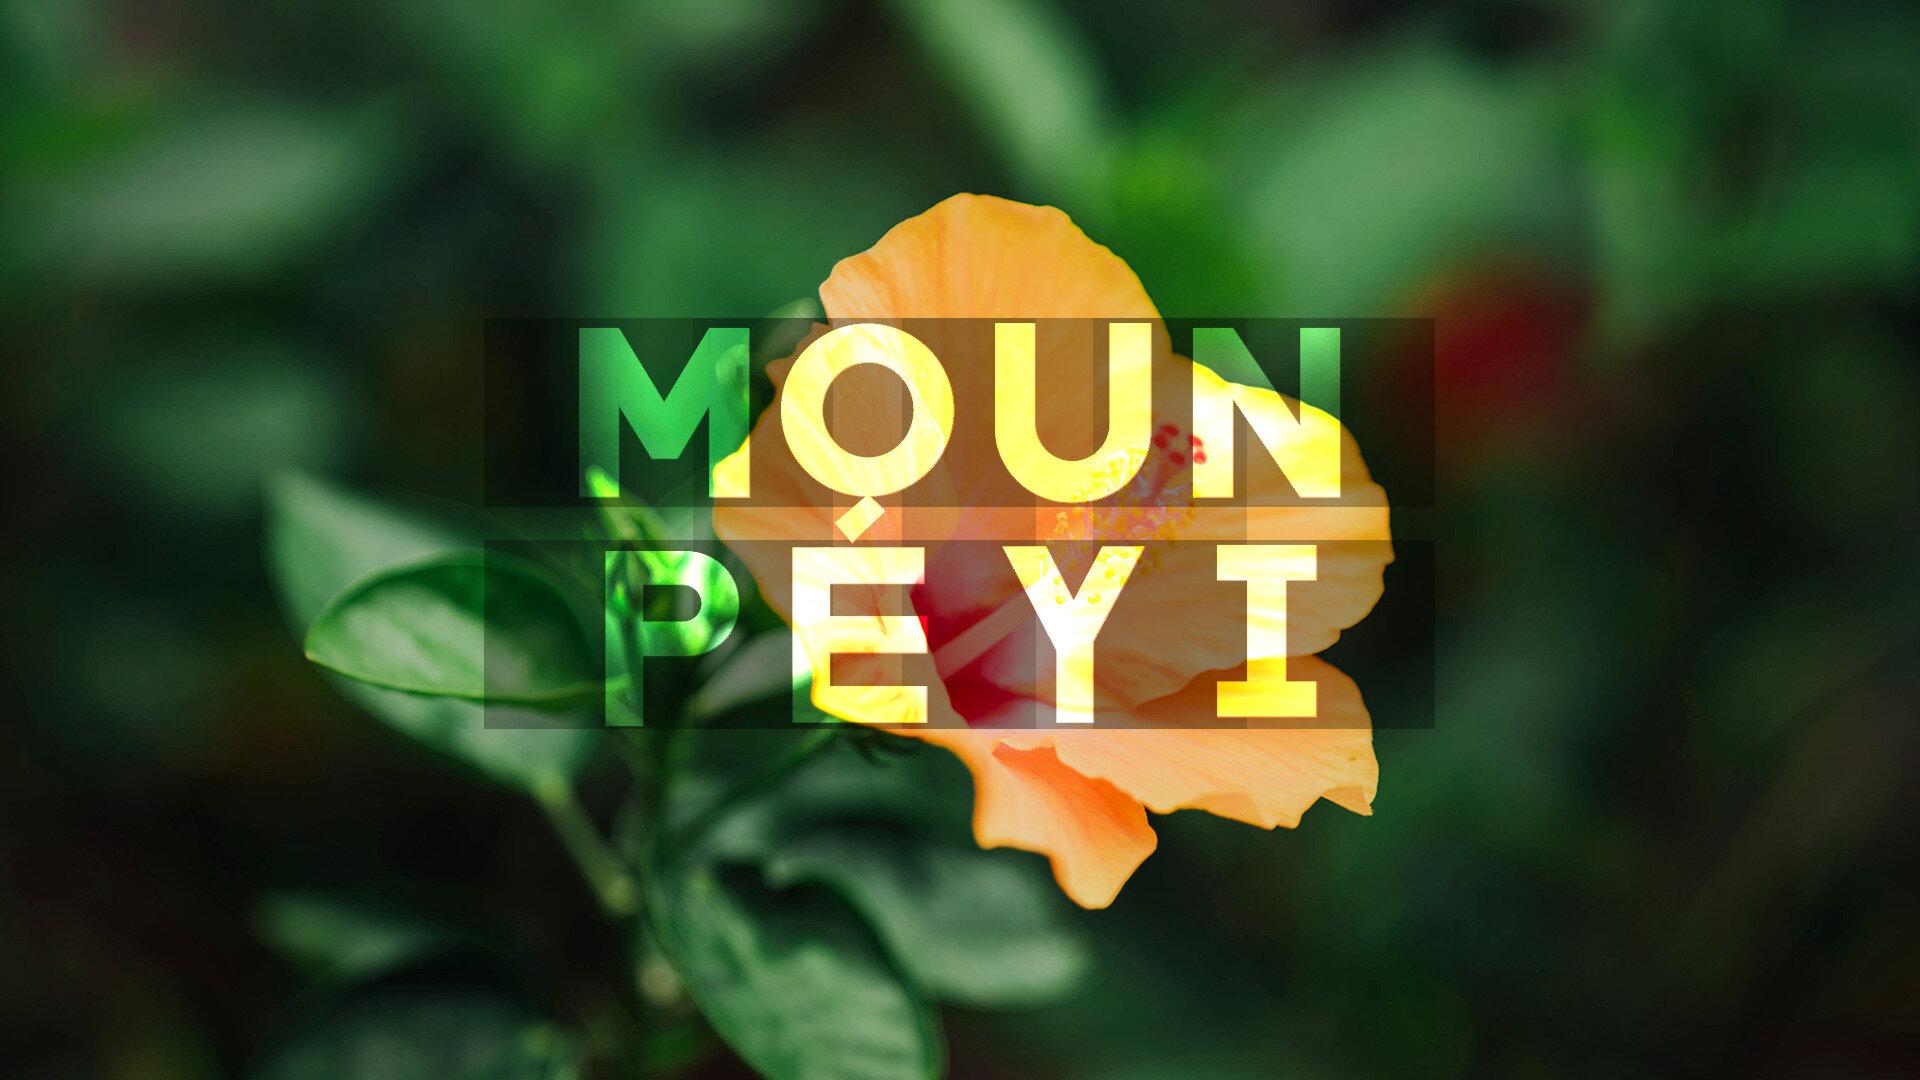 Moun péyi : Fifi